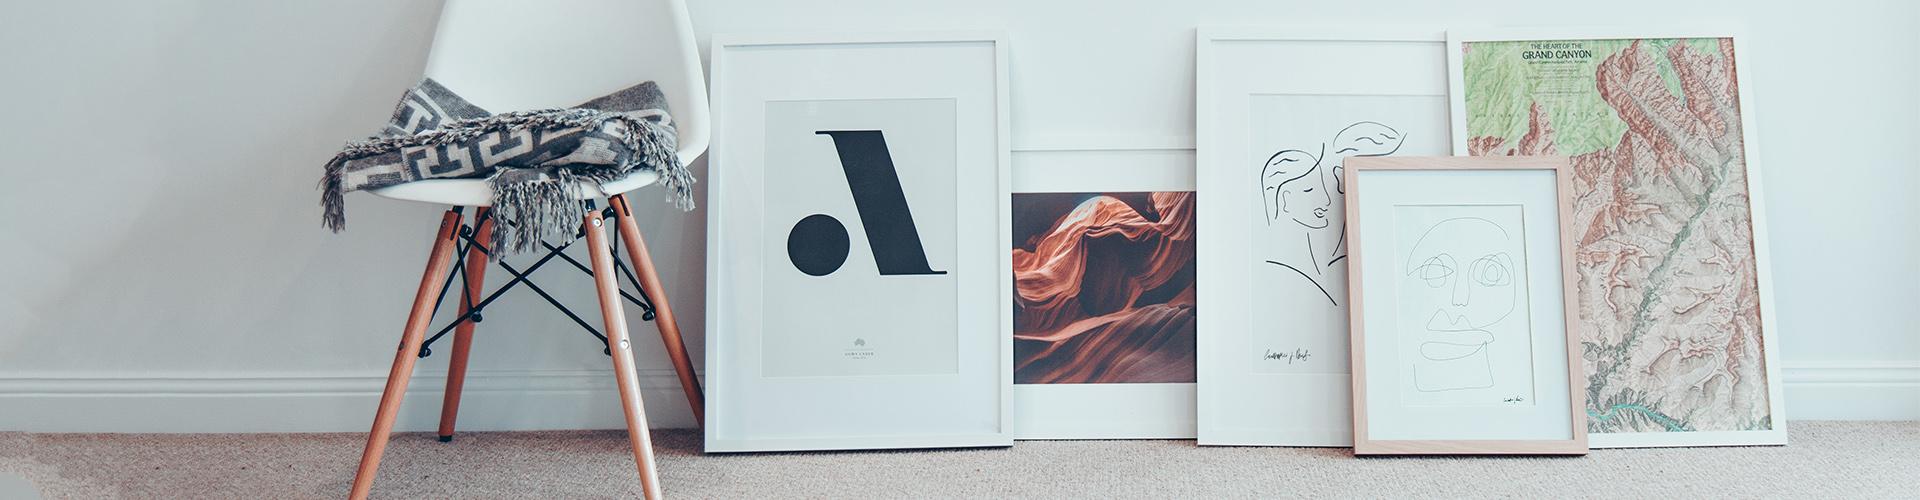 ../images/services/village-printer-matting-framing-finishing.jpg